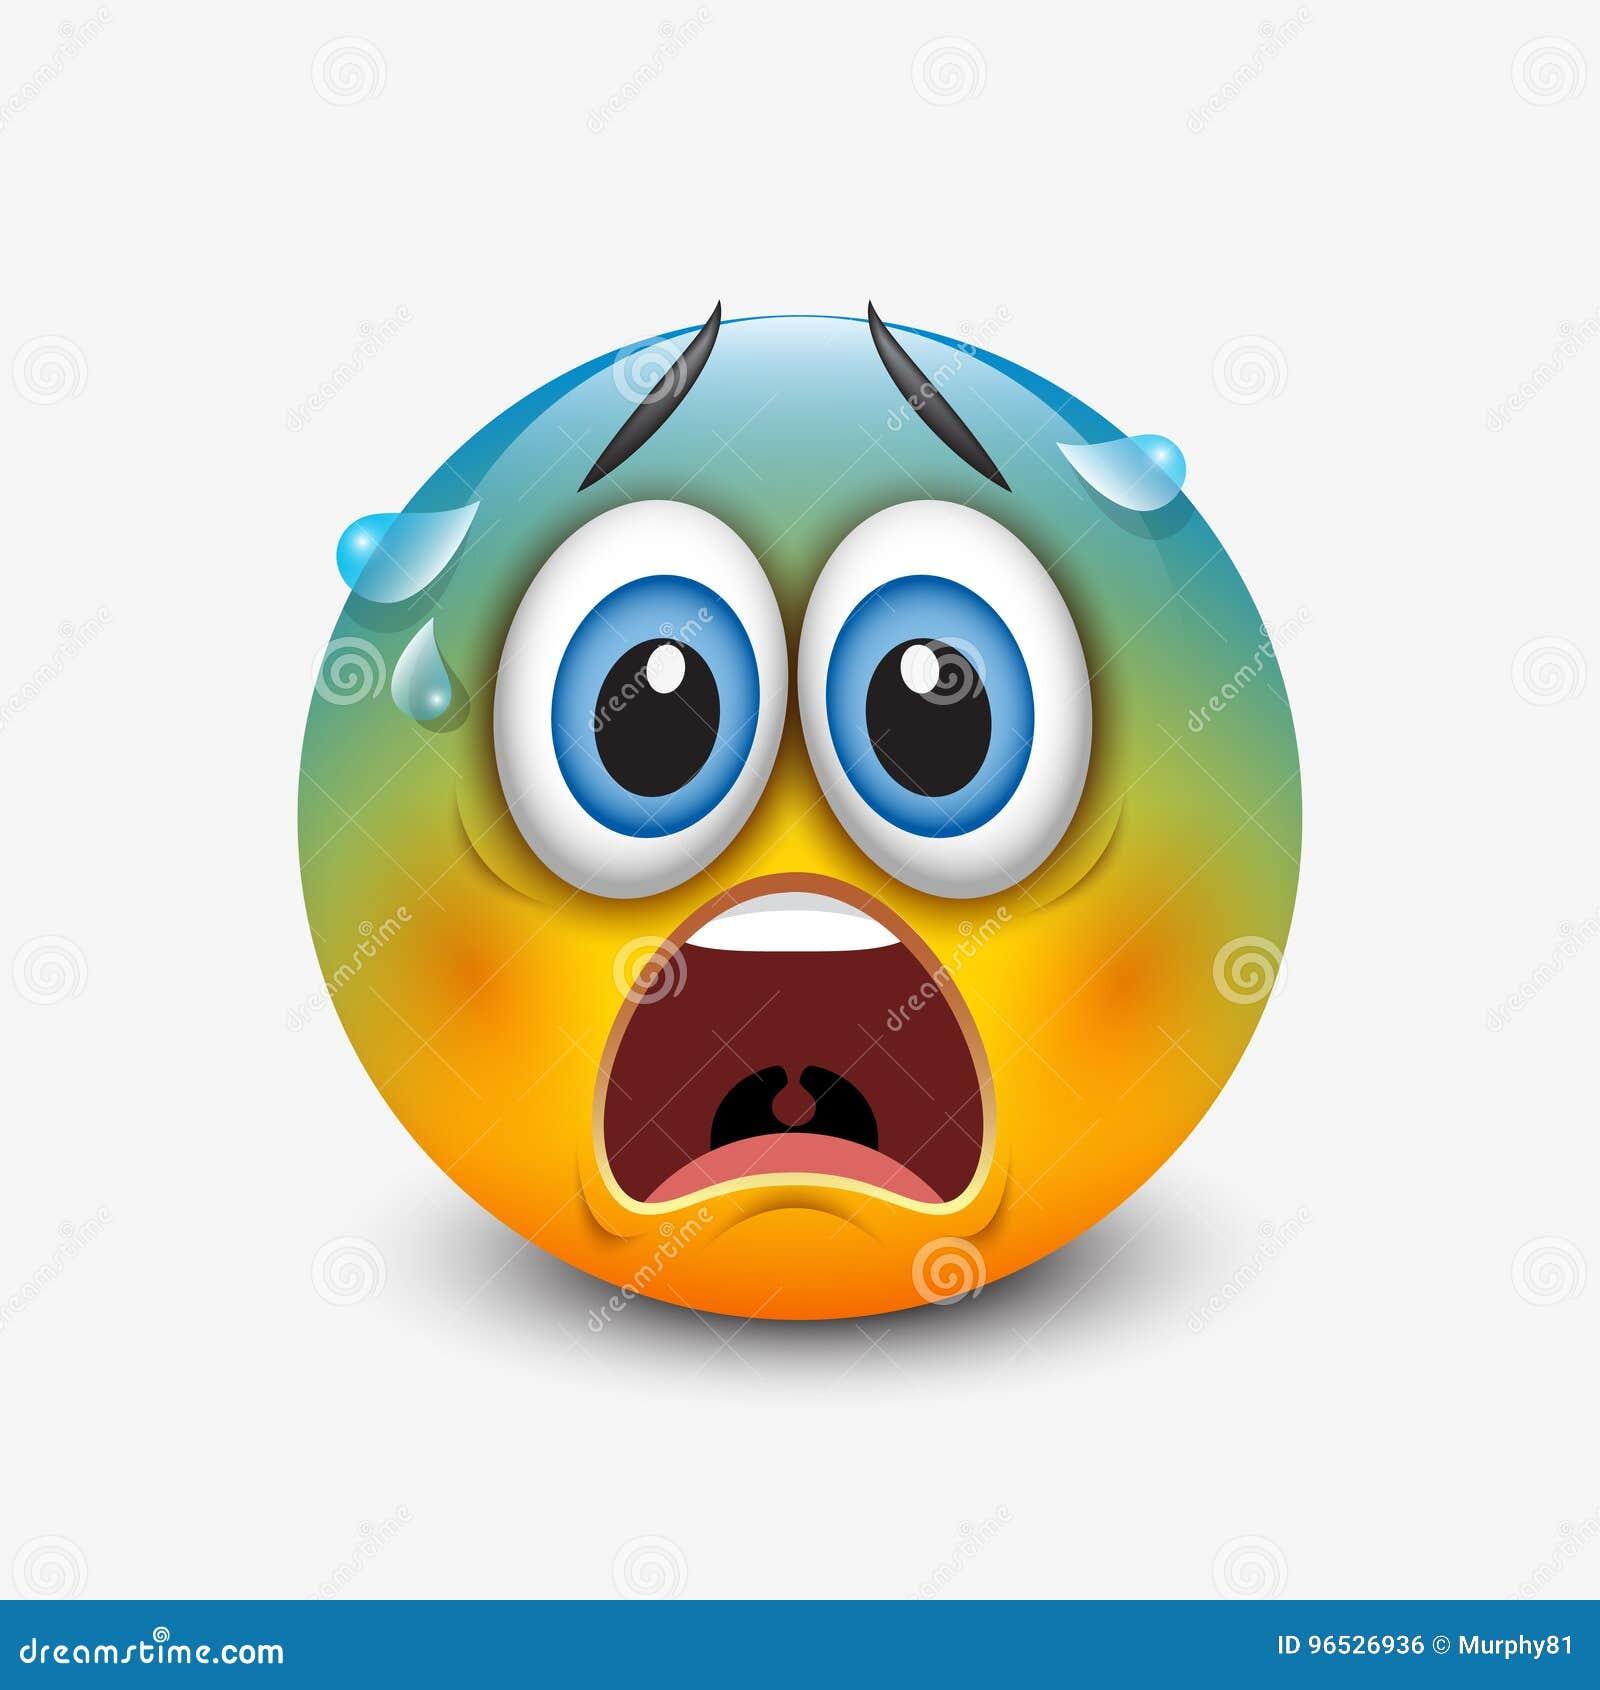 doen schrikken emoticon  emoji  smiley vectorillustratie emotion clipart black and white emotional clip art